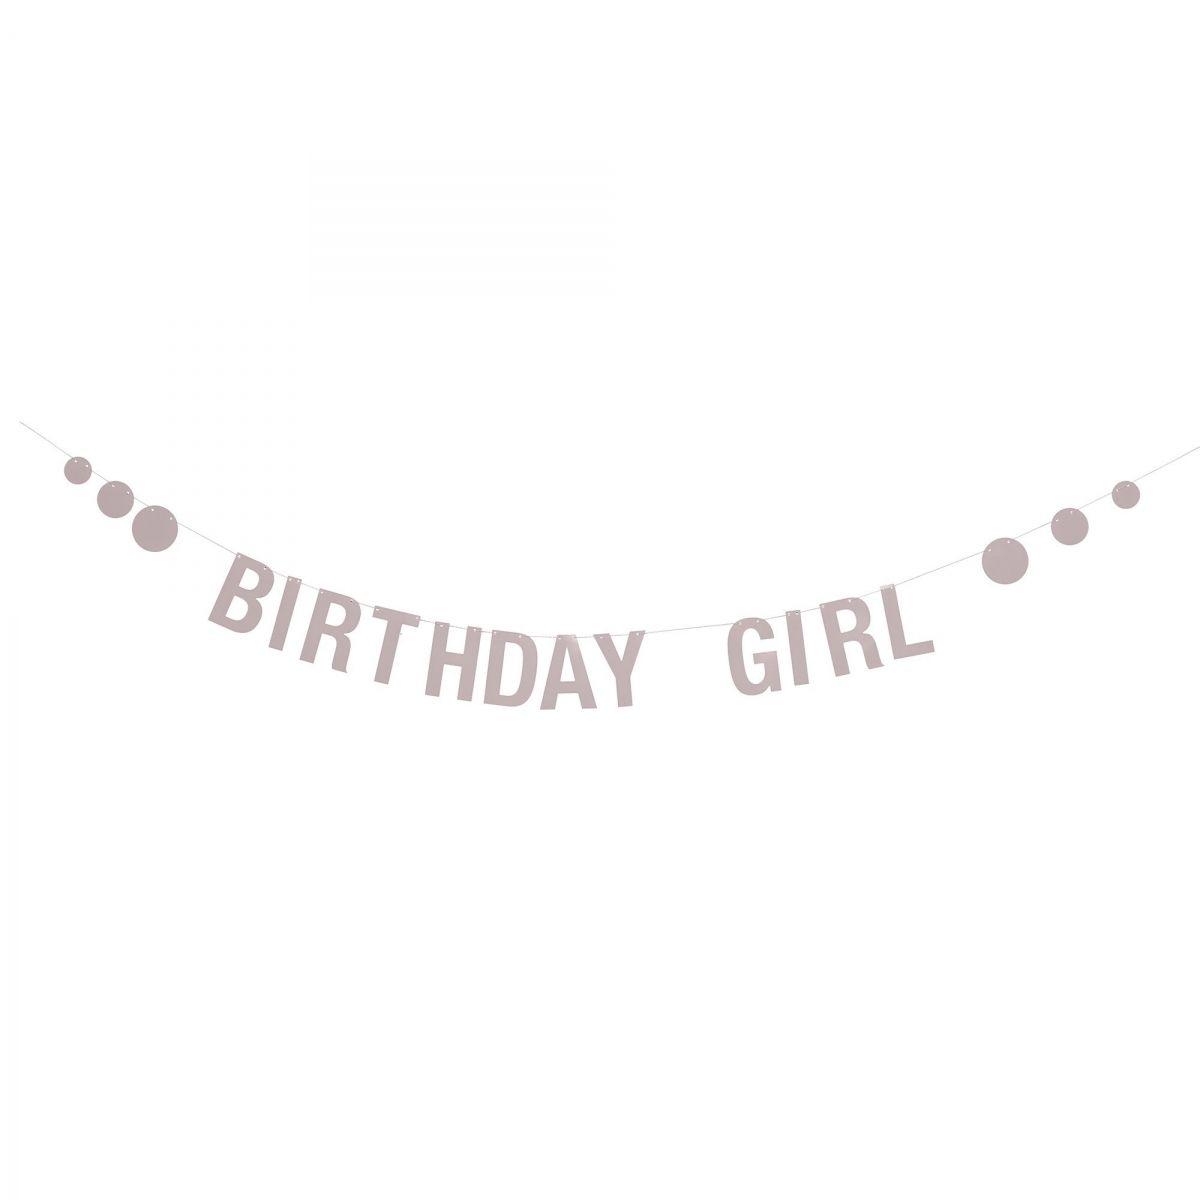 Girlanda Birthday Girl różowa papierowa - Bloomingville